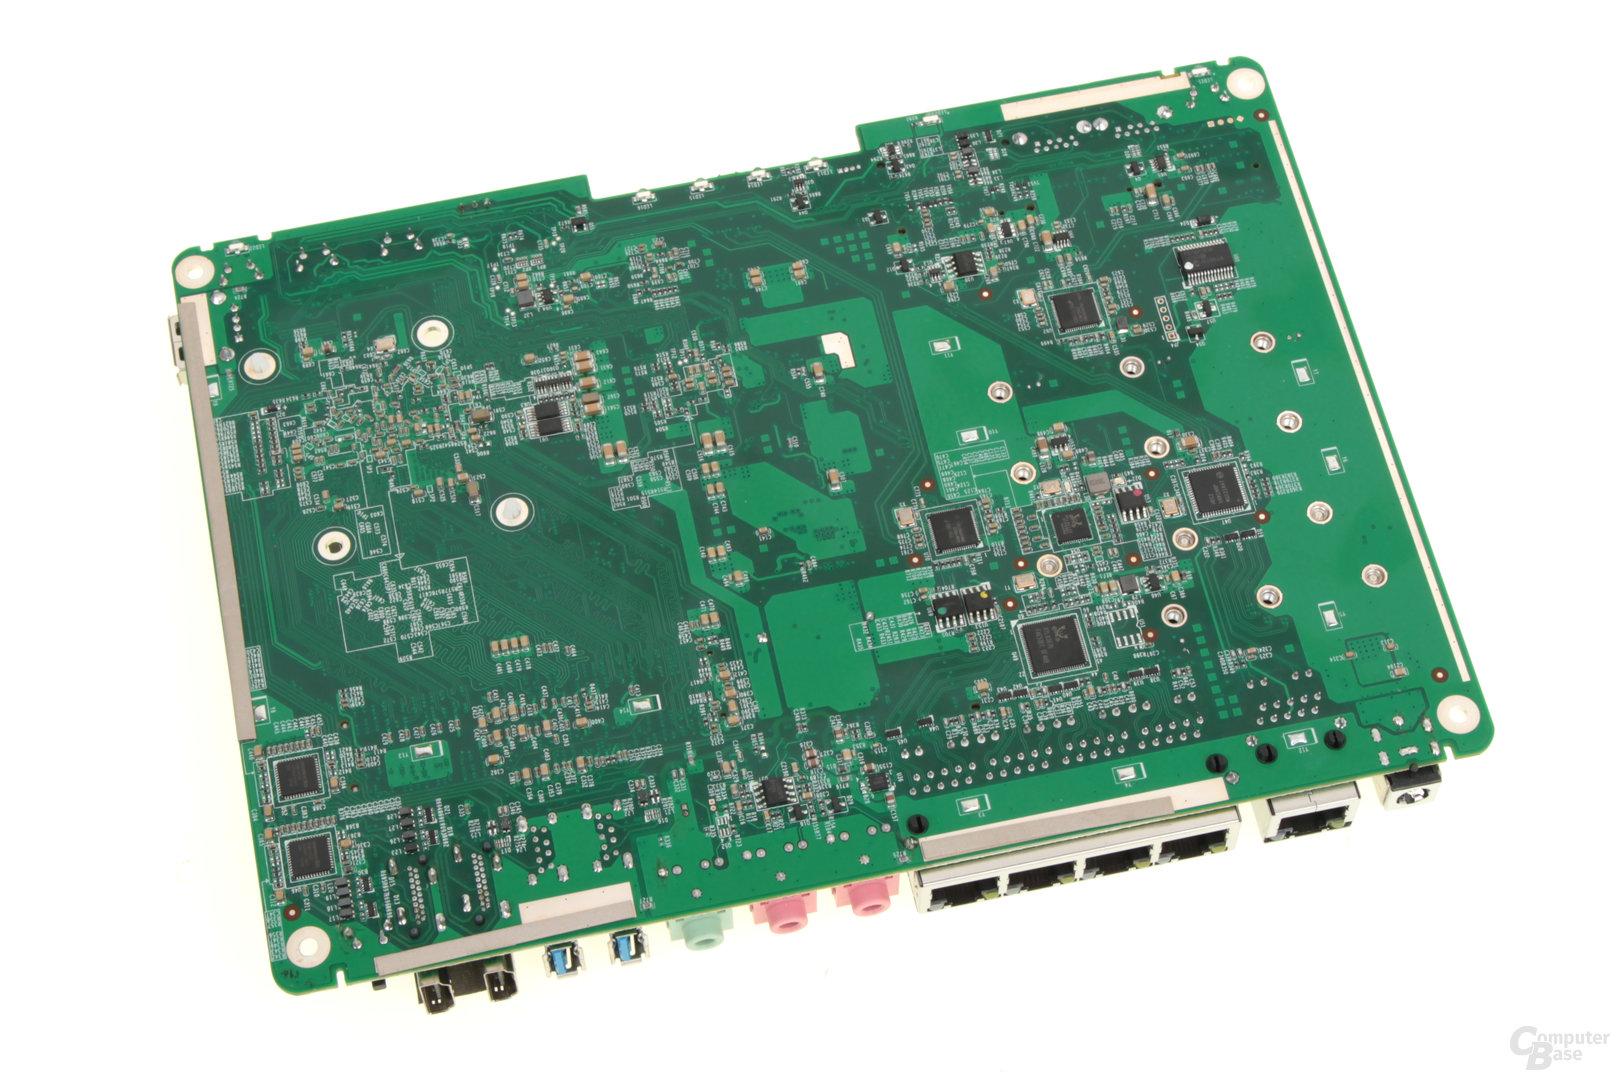 QNAP TBS-453A – Rückseite der Hauptplatine